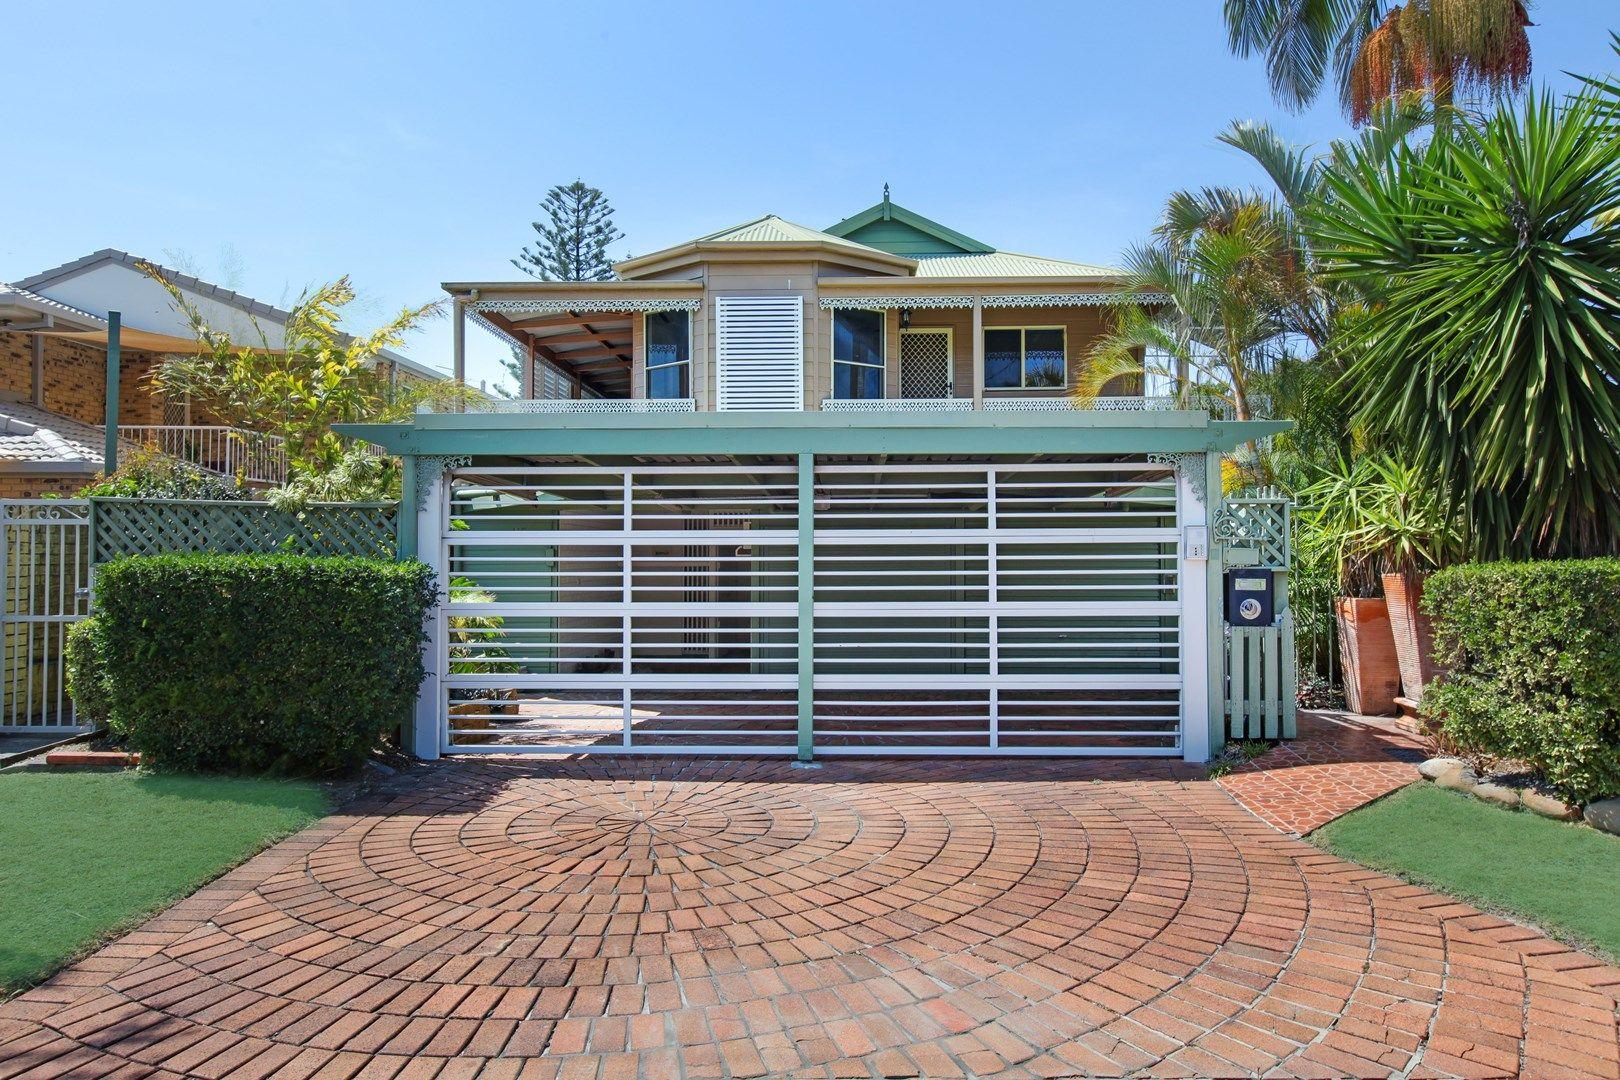 115A Petrel Avenue, Mermaid Beach QLD 4218, Image 0